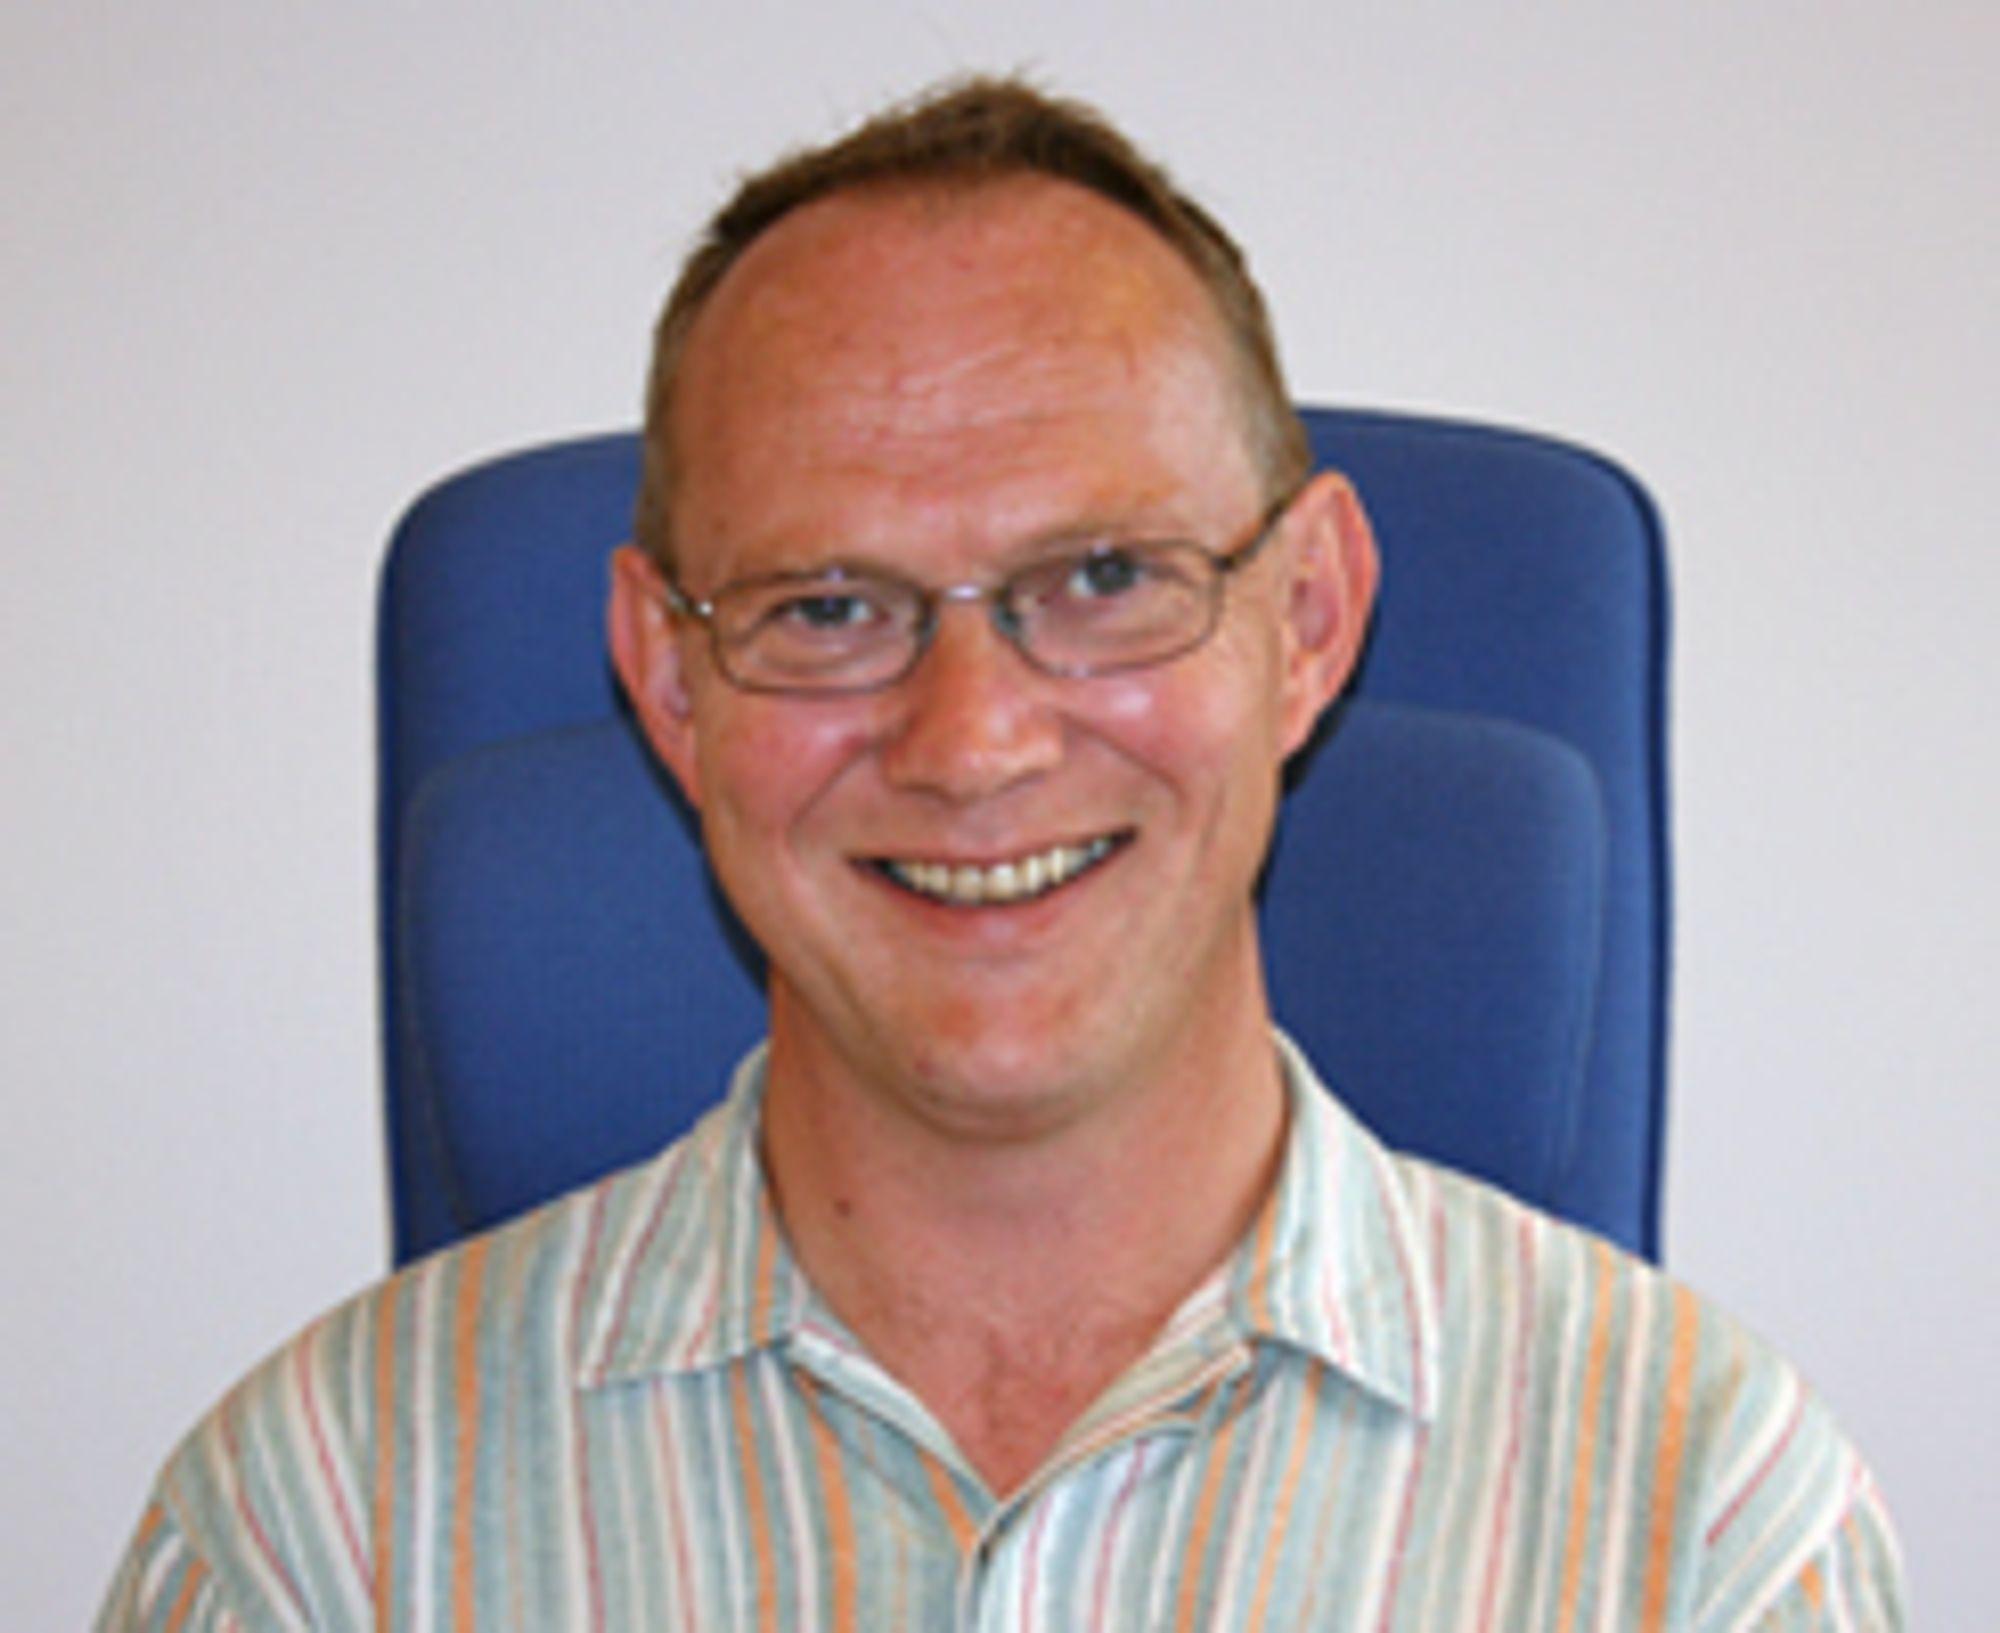 Pål Pedersen, rektor ved Høgskolen i Bodø, vil ha slutt på konkurransen.